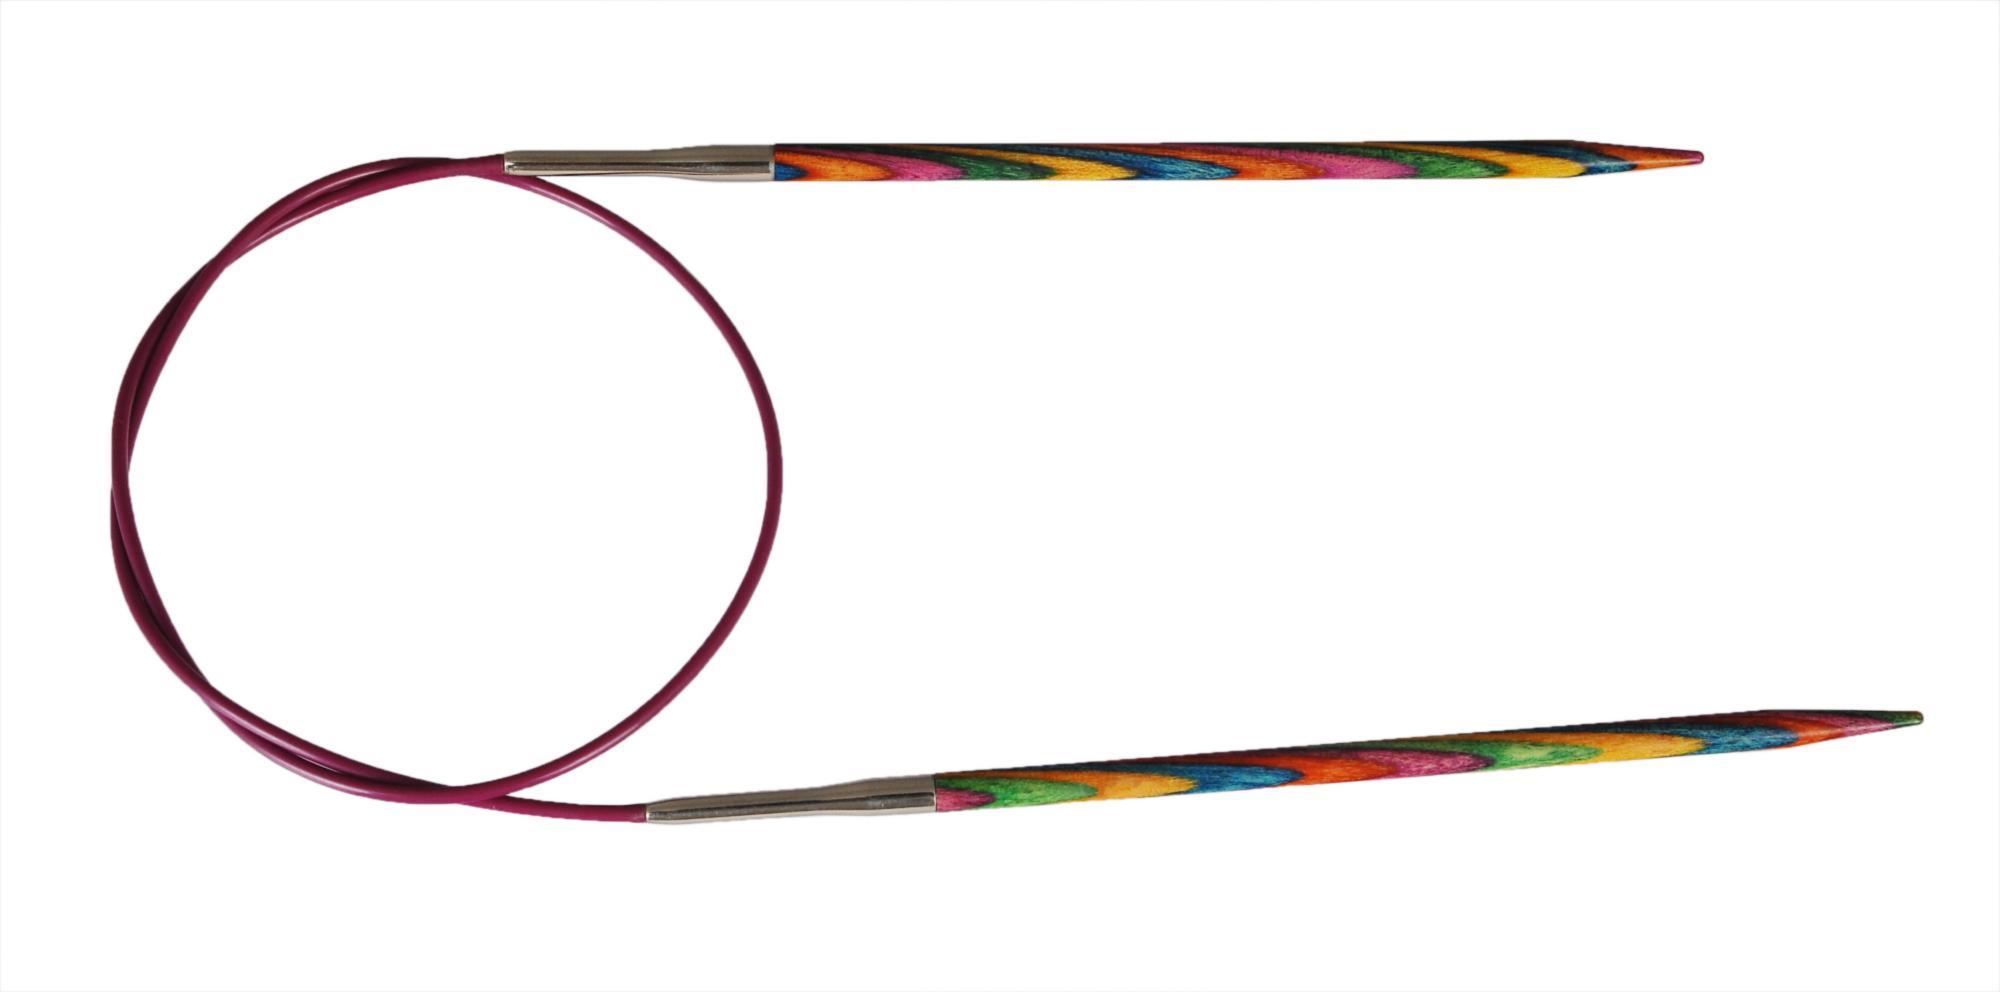 Спицы круговые 100 см Symfonie Wood KnitPro, 21360, 9.00 мм